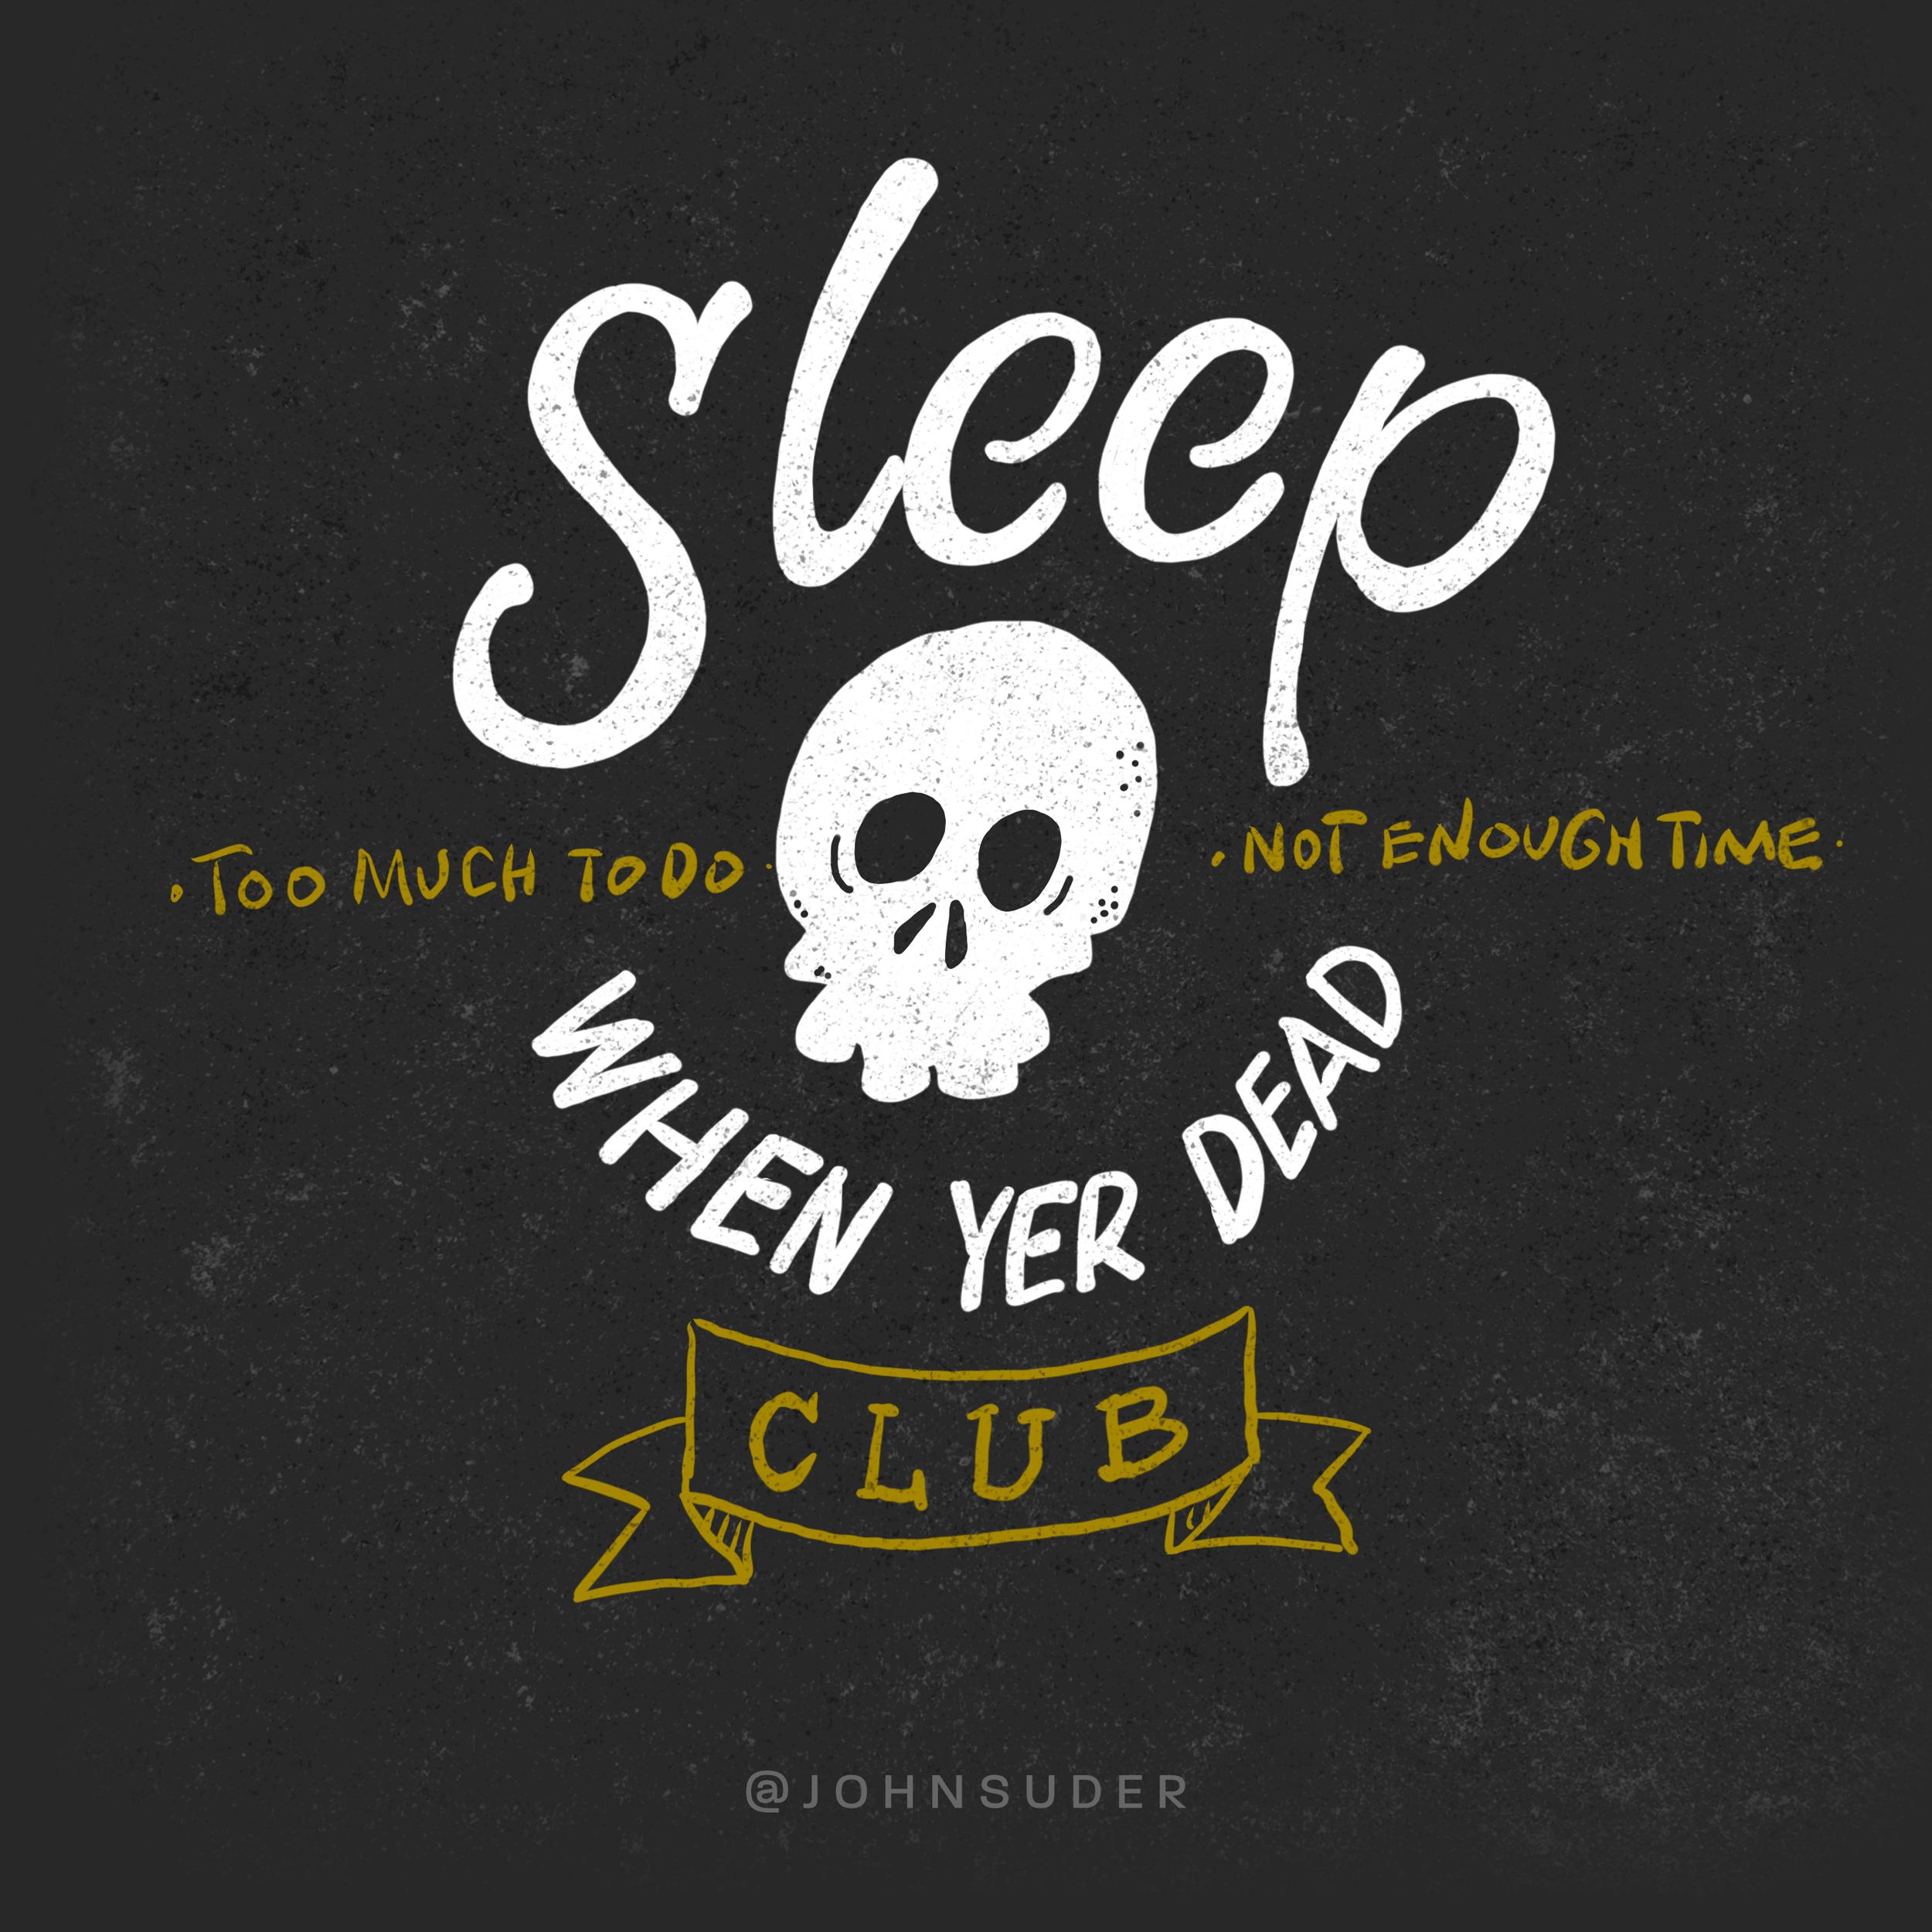 sleep when yer dead club by john suder.png